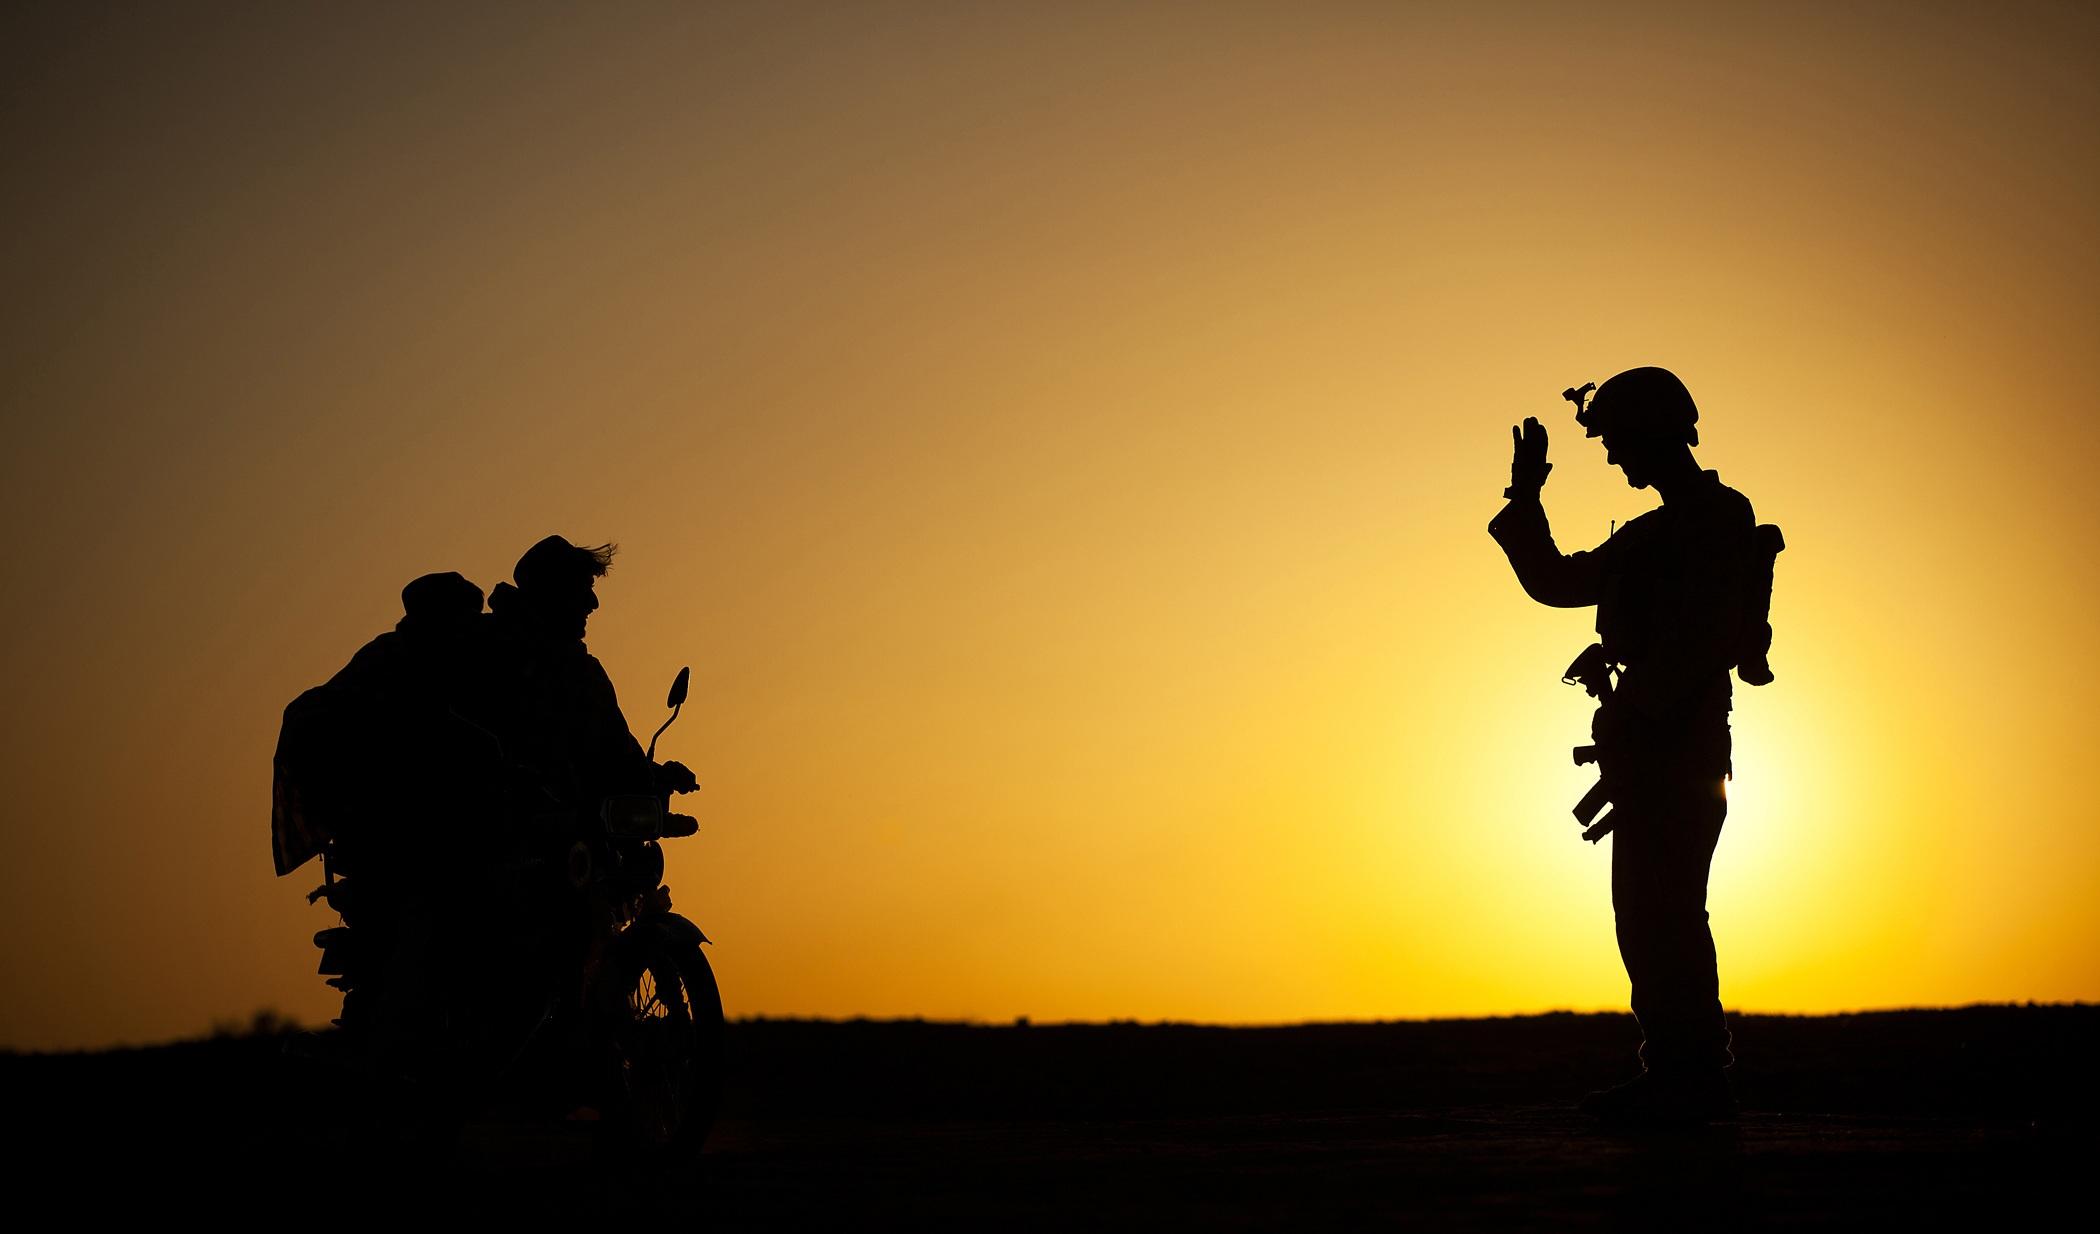 Soldier Waving to Civilians, Activity, Dark, Duty, People, HQ Photo